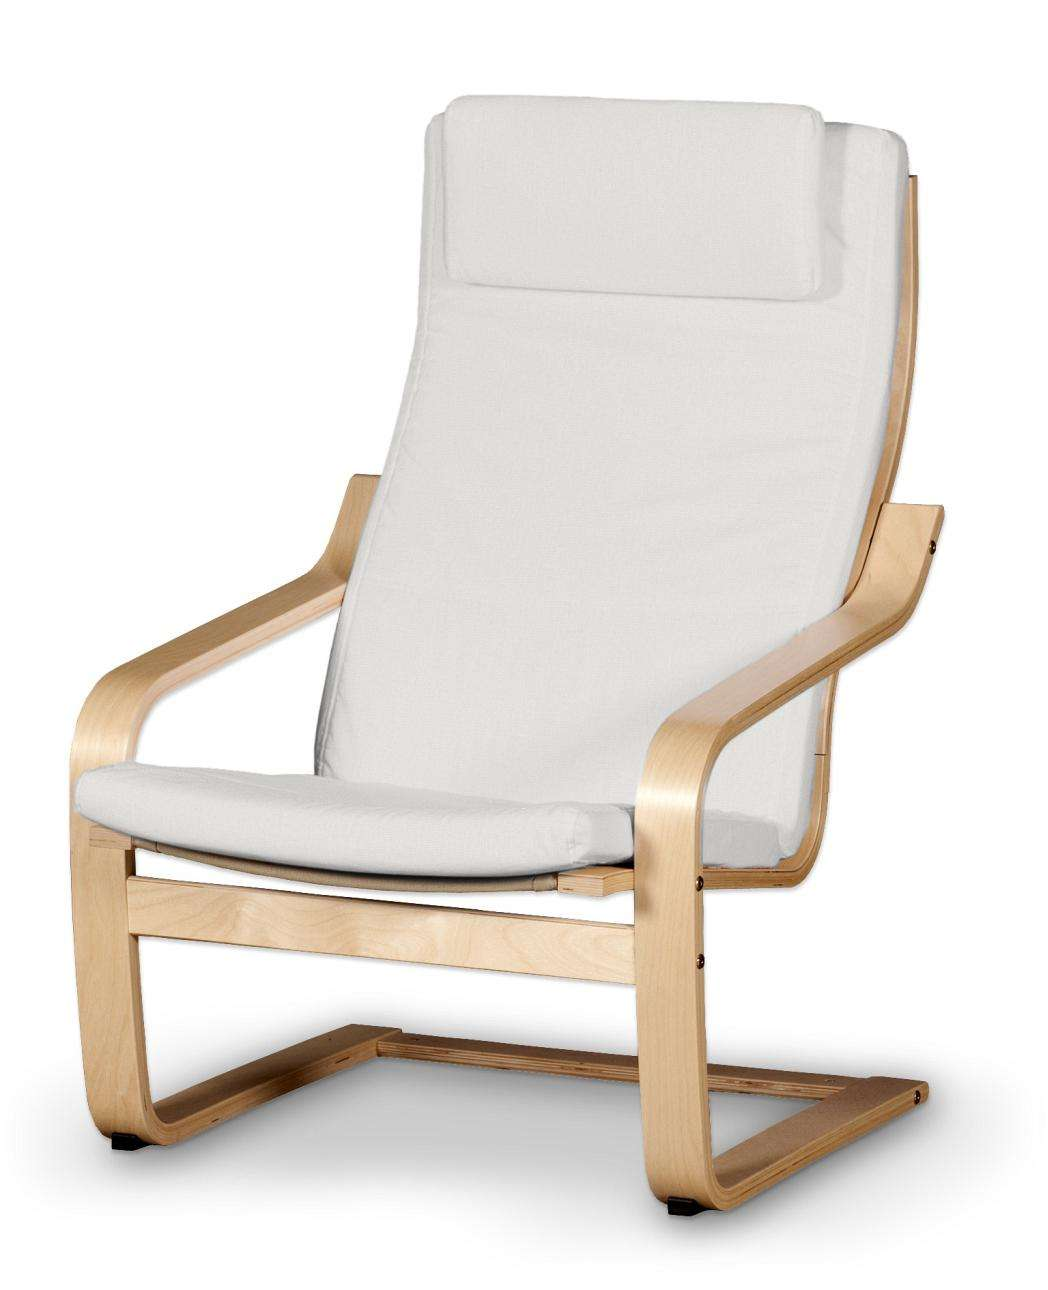 Poduszka na fotel Poäng II Fotel Poäng II w kolekcji Etna , tkanina: 705-01